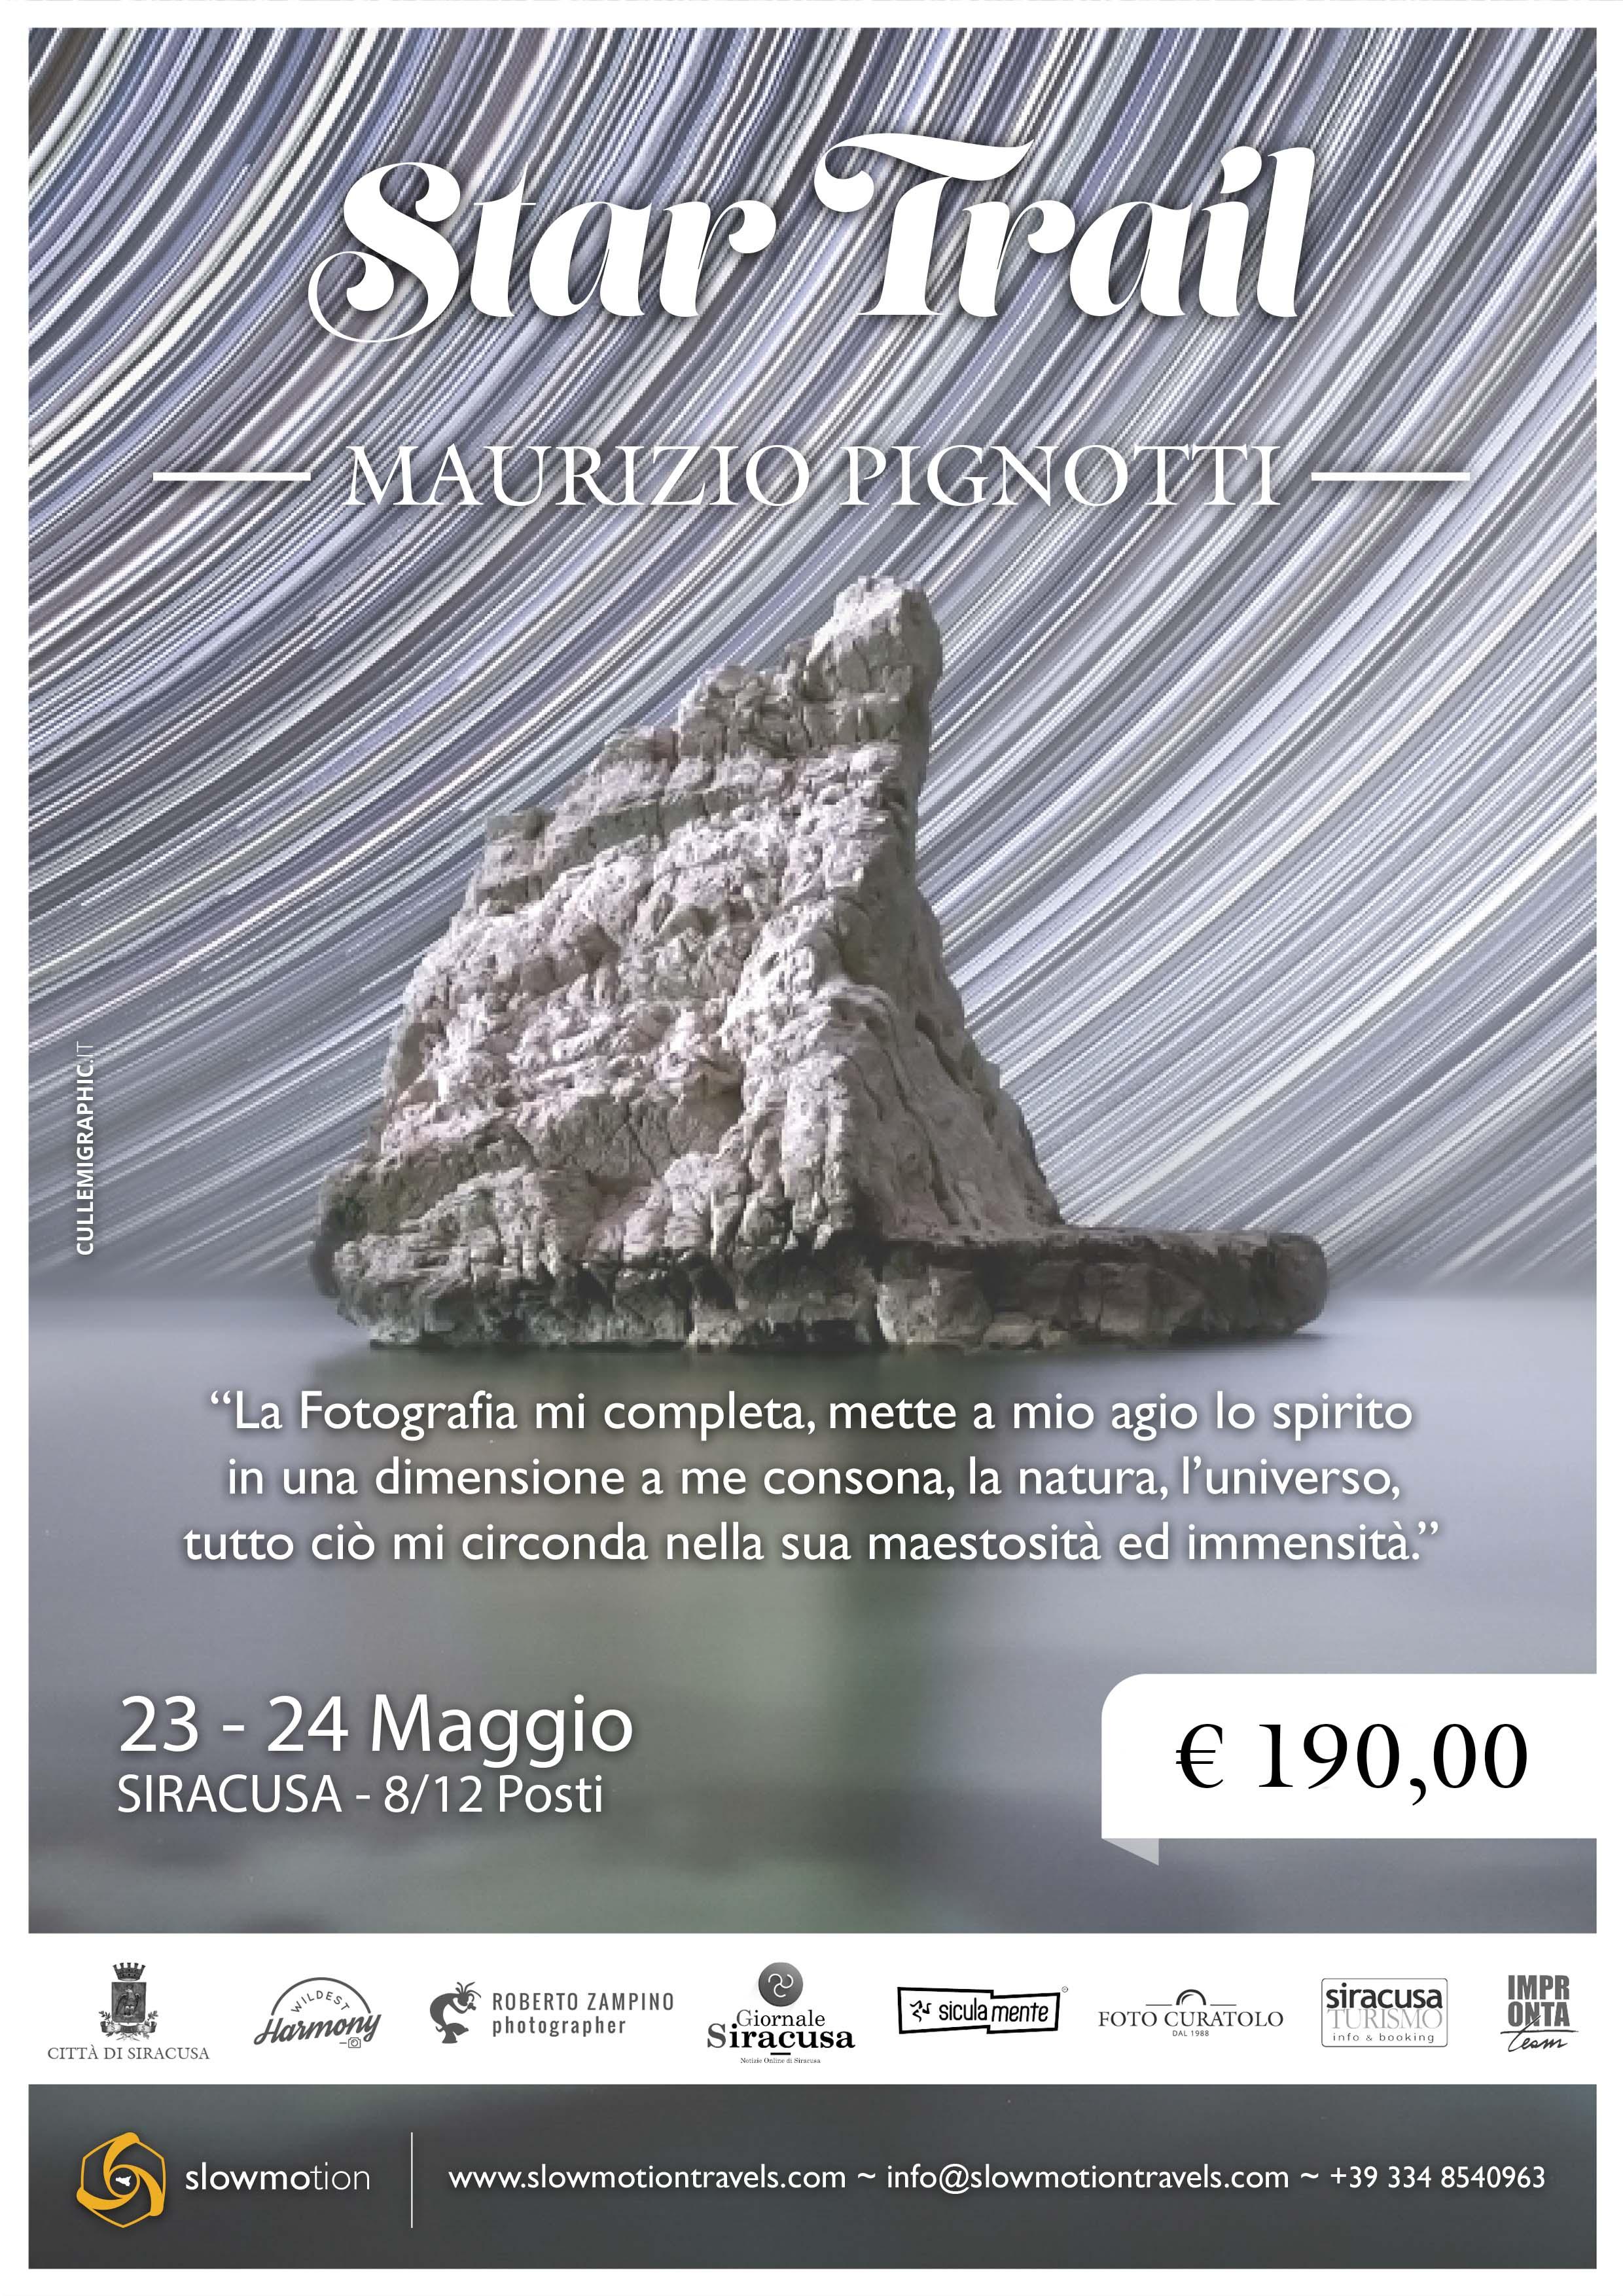 workshop star trail con maurizio pignotti